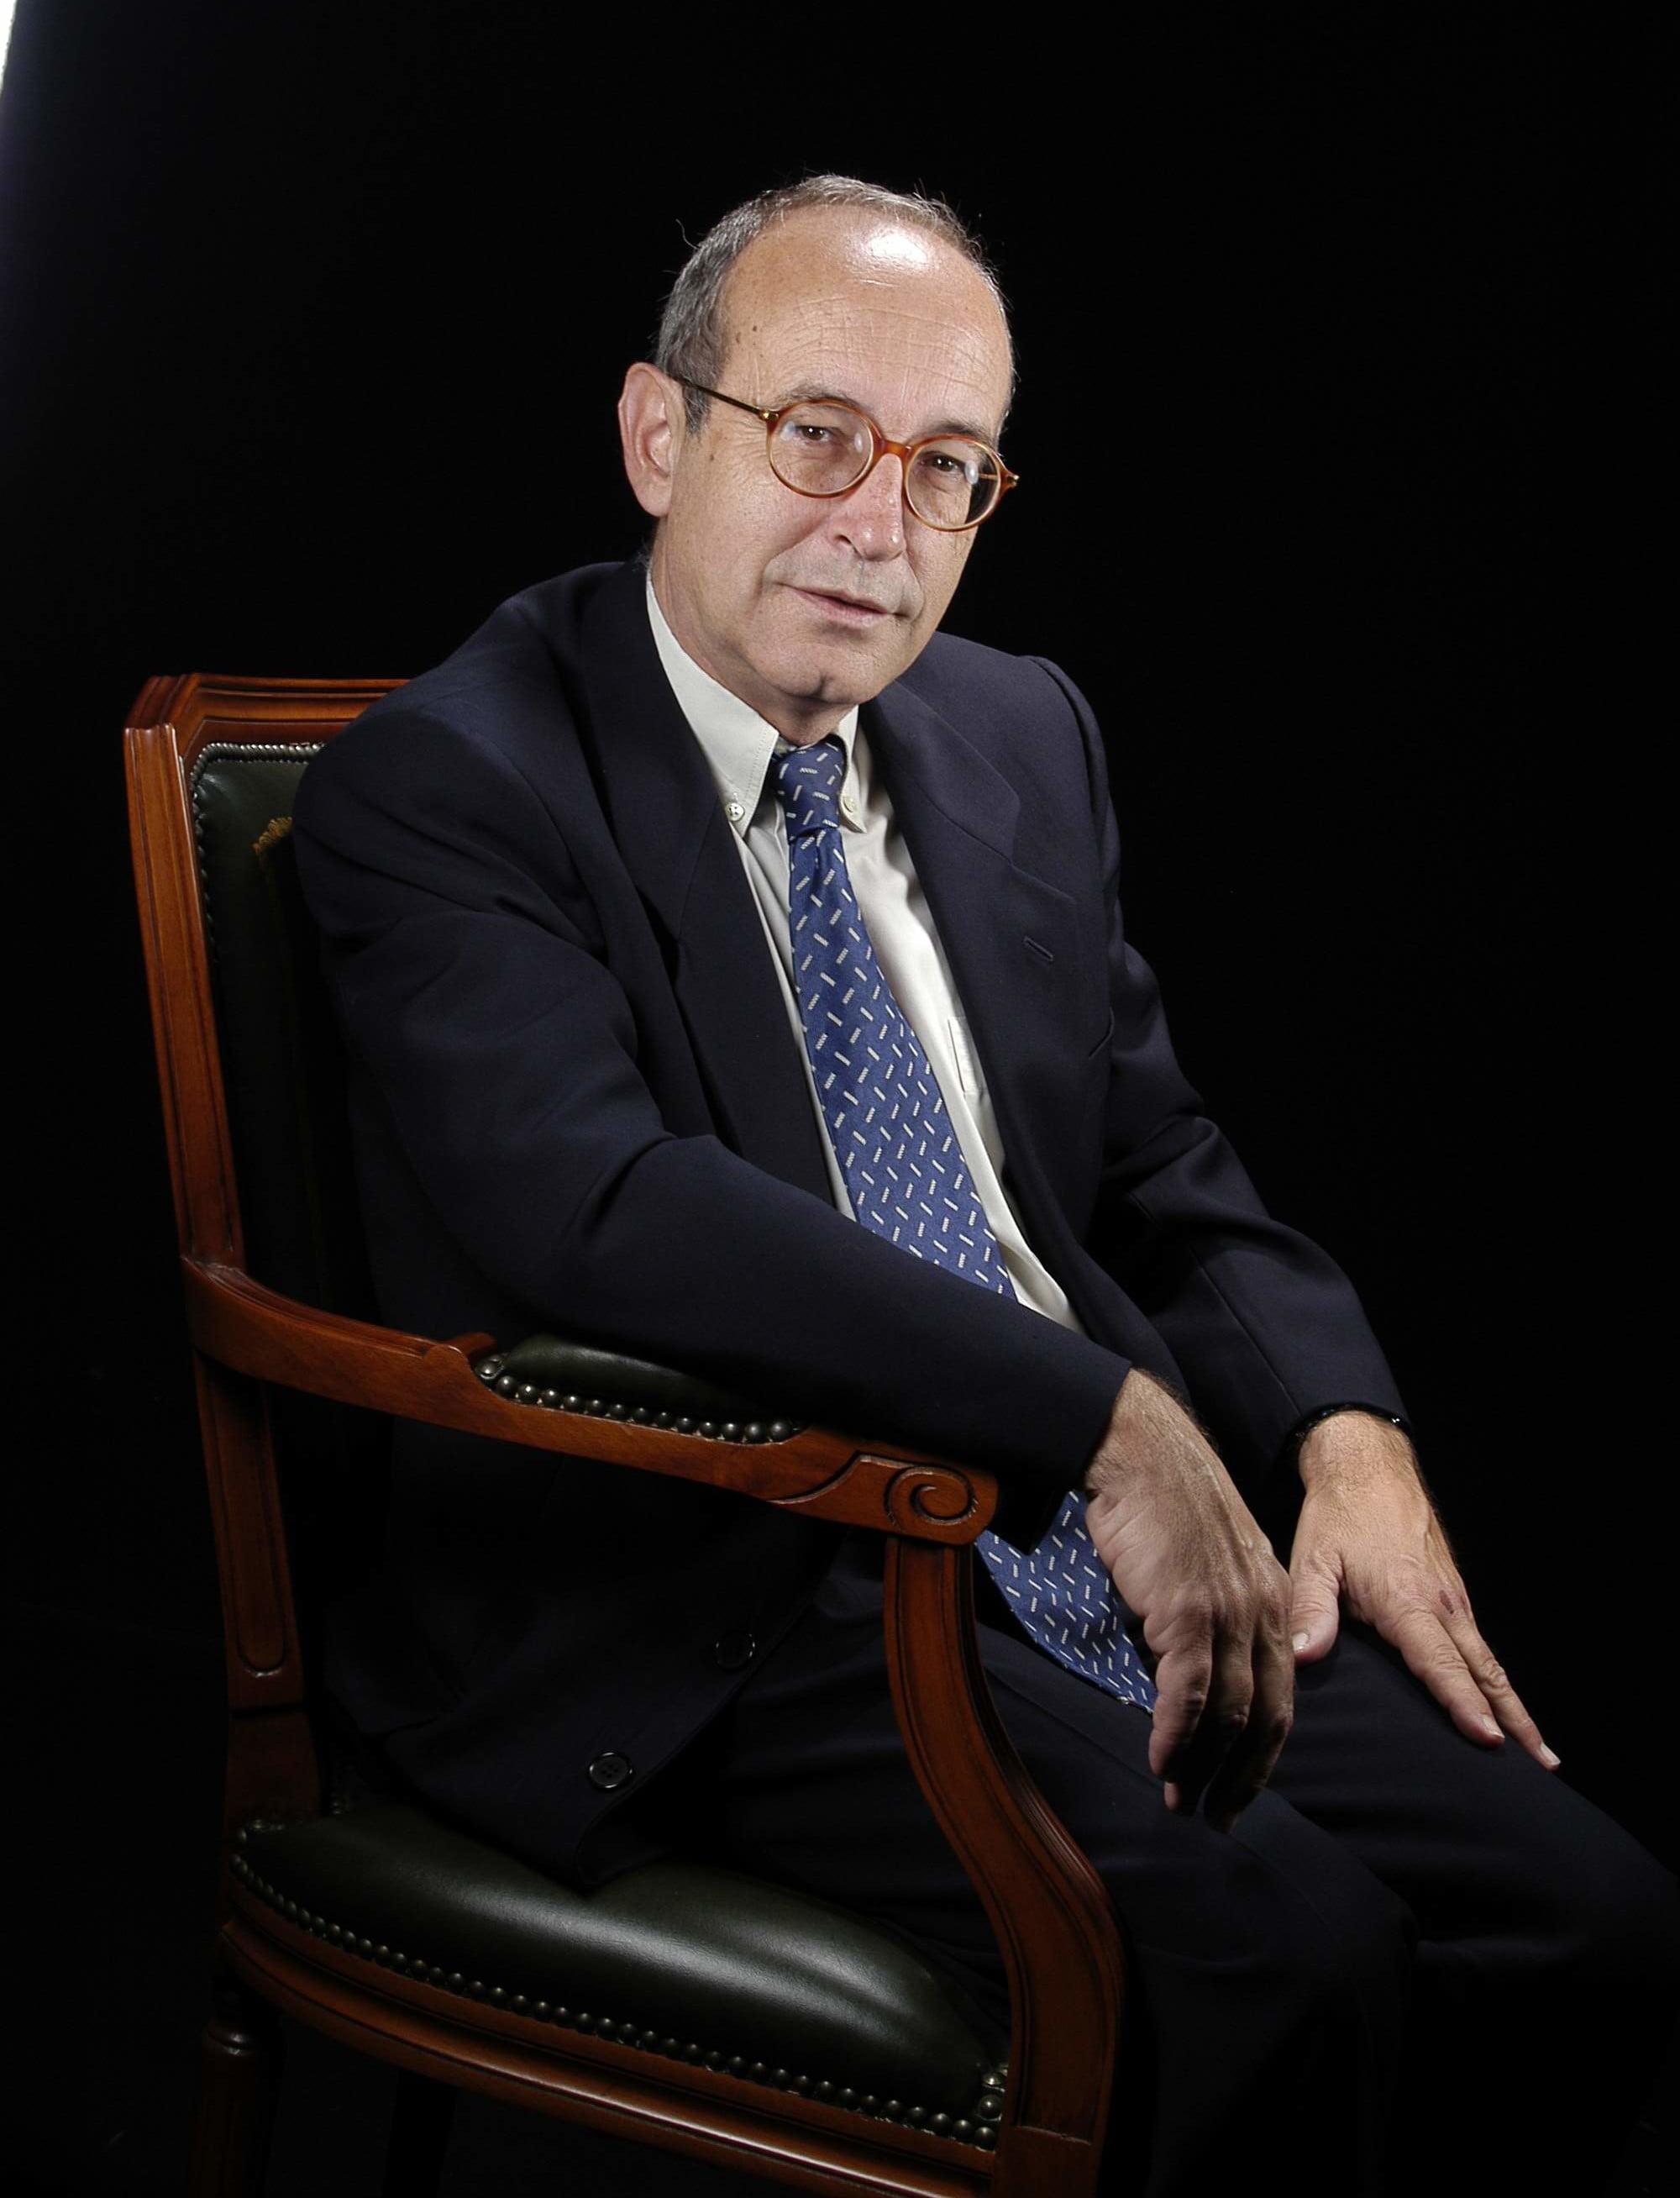 Dr. Joaquim Coll Daroca